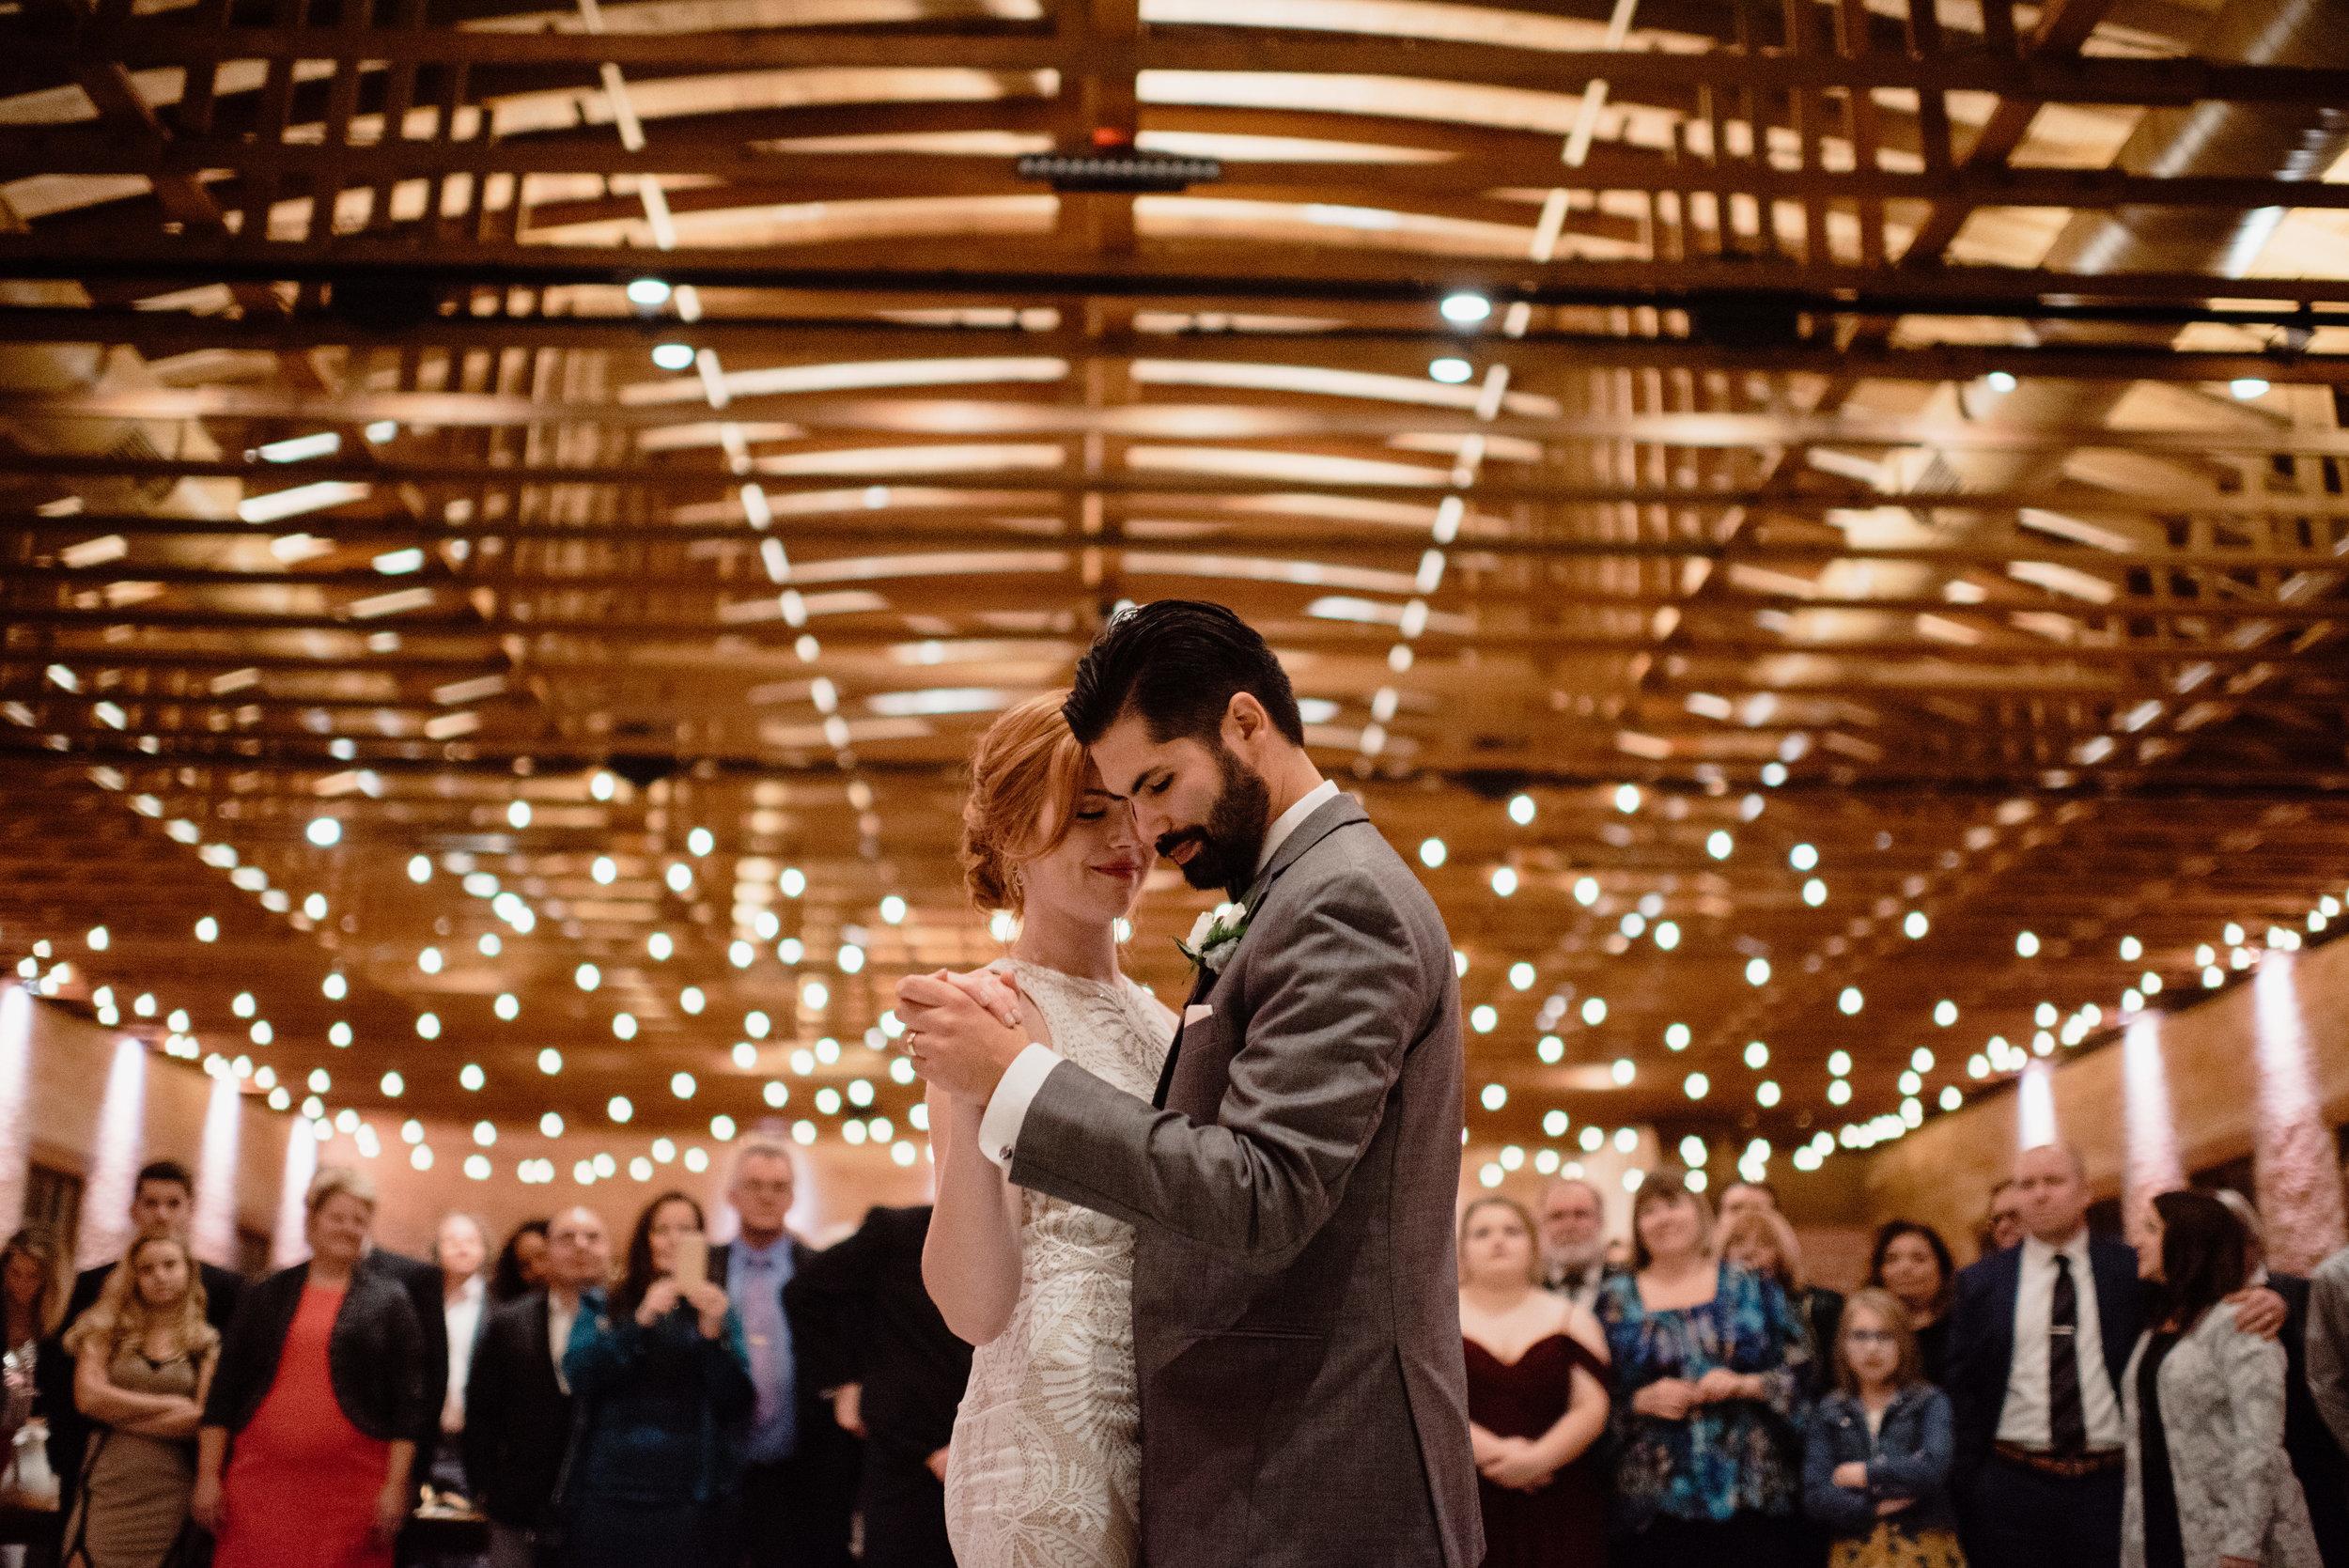 The Brix on Fox, Chicago Wedding Photographer, Zach and Rosalie00089.jpg